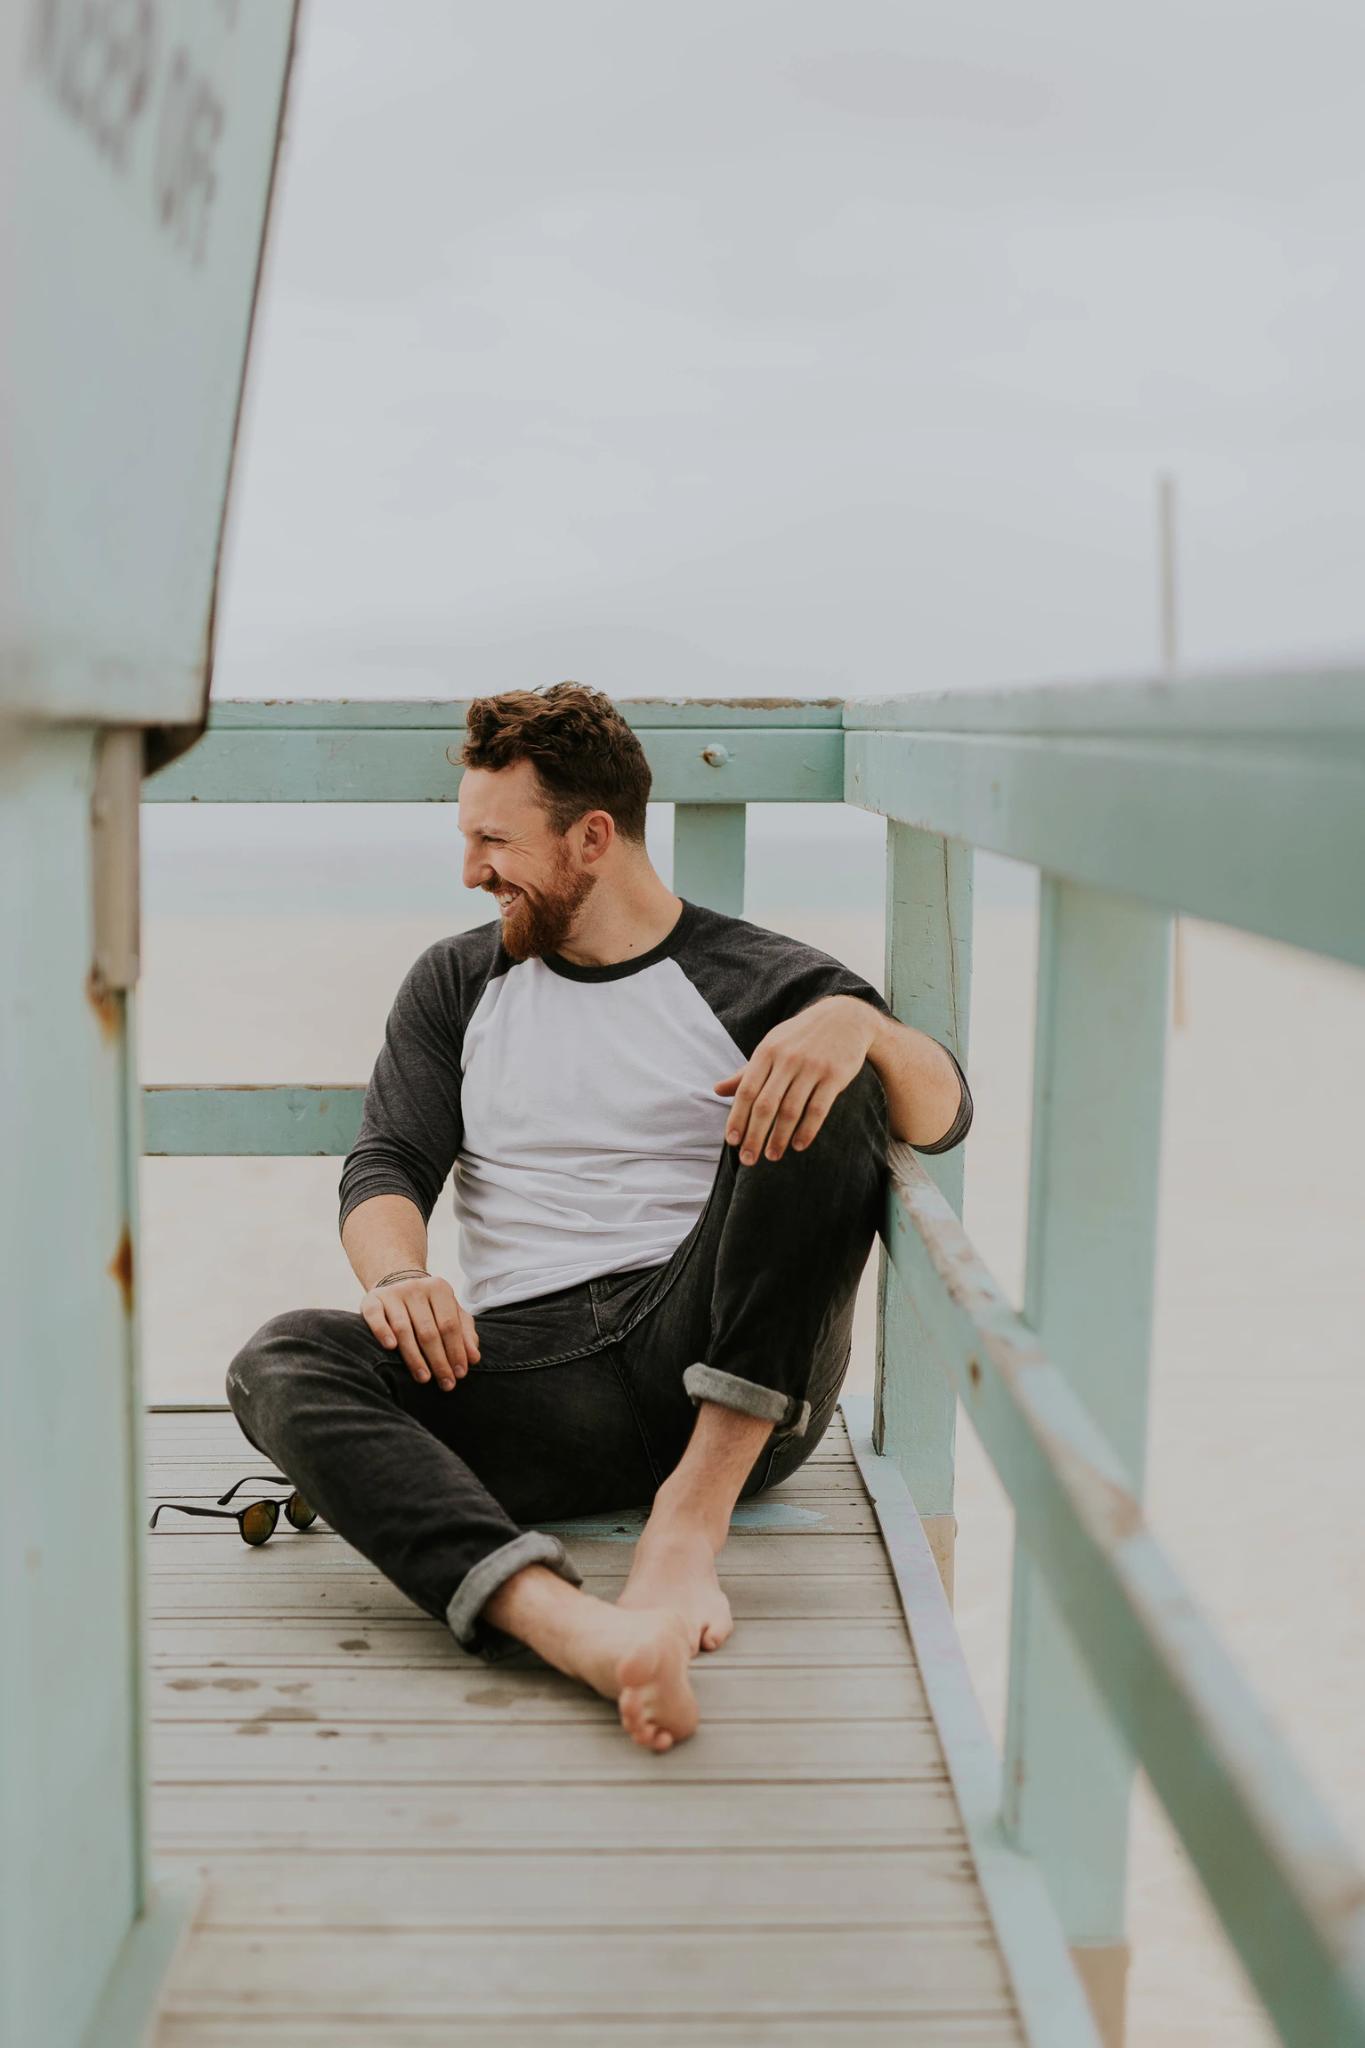 palewave men's style guide pants